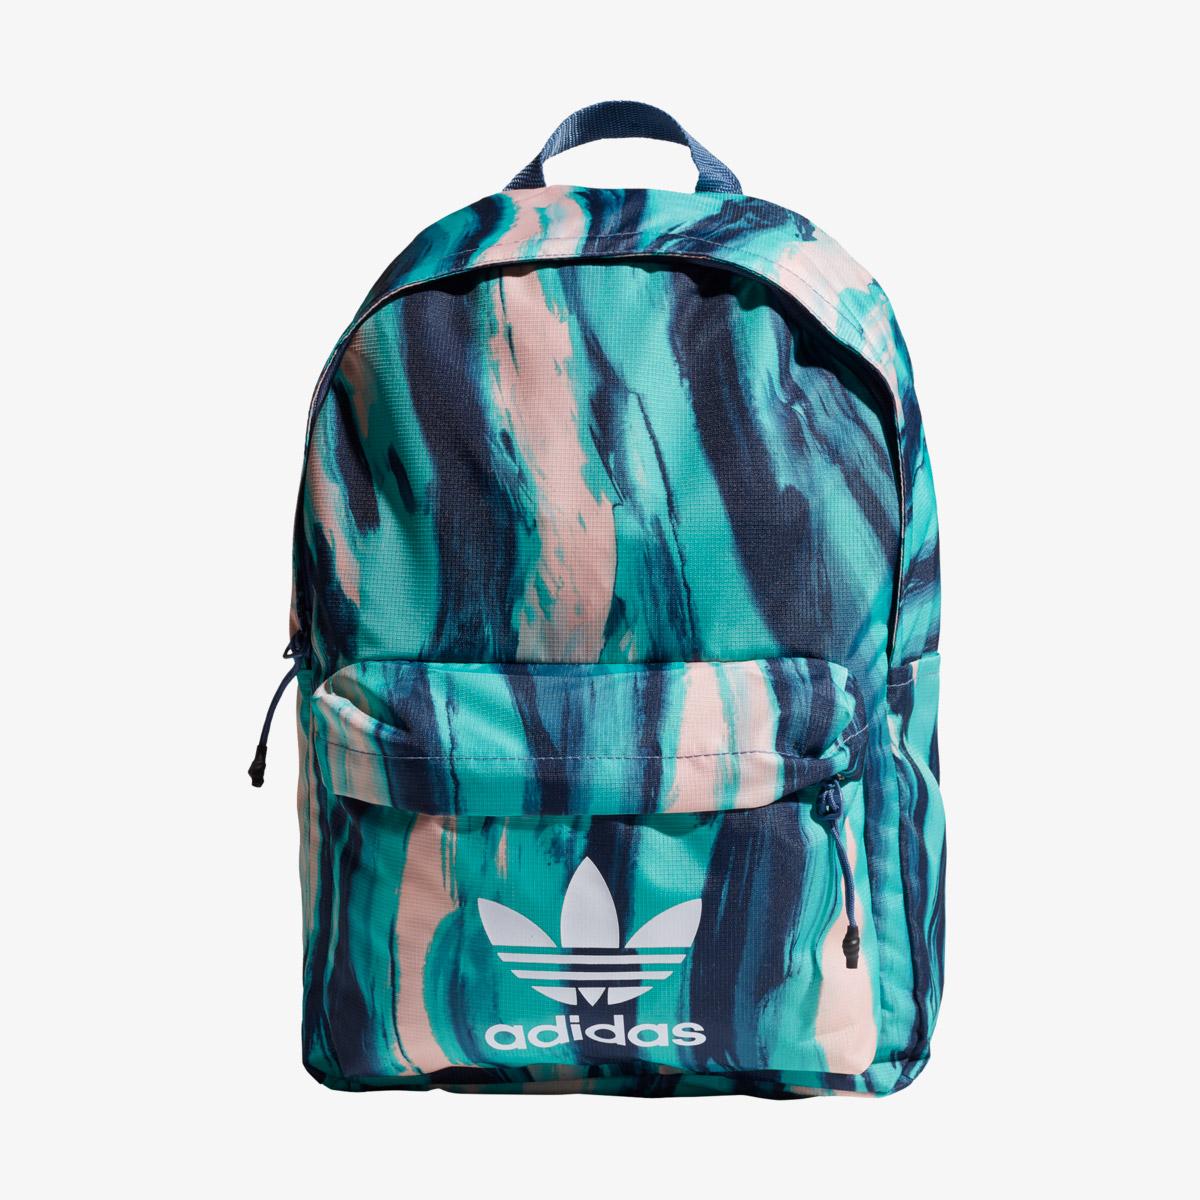 Adidas Раница RYV BP